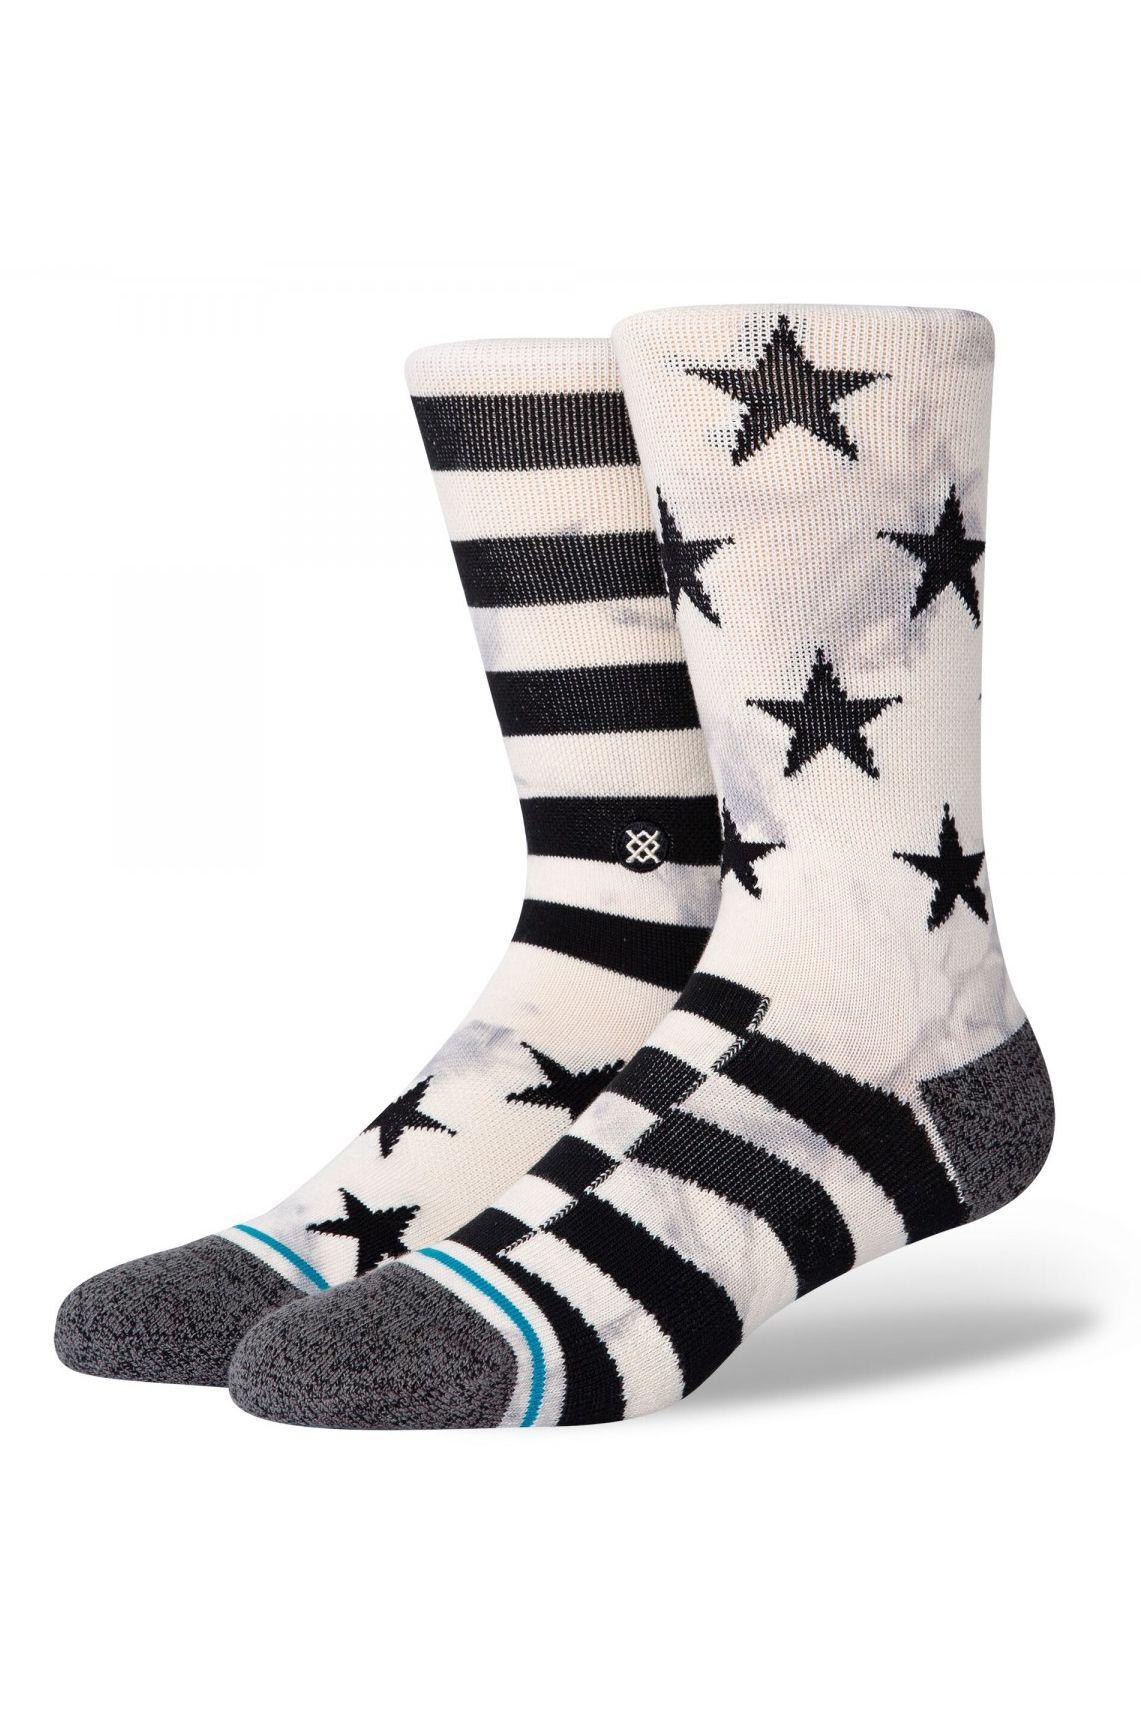 Stance Socks SIDEREAL 2 Grey